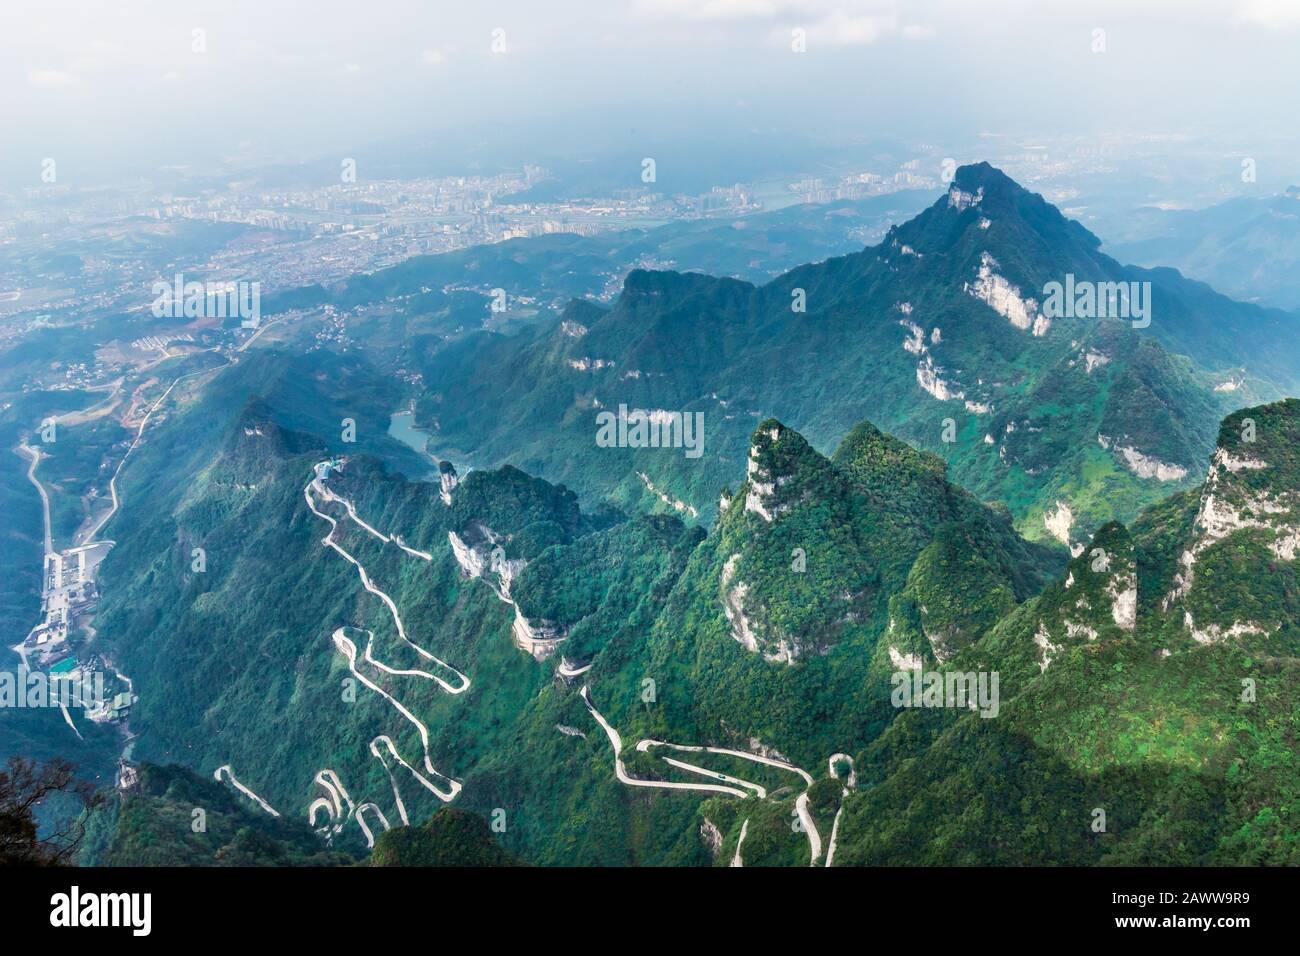 Heaven Linking Avenue of 99 curves at winding Road to The Heaven's Gate, Zhangjiagie, Tianmen Mountain National Park, Hunan, China Stock Photo